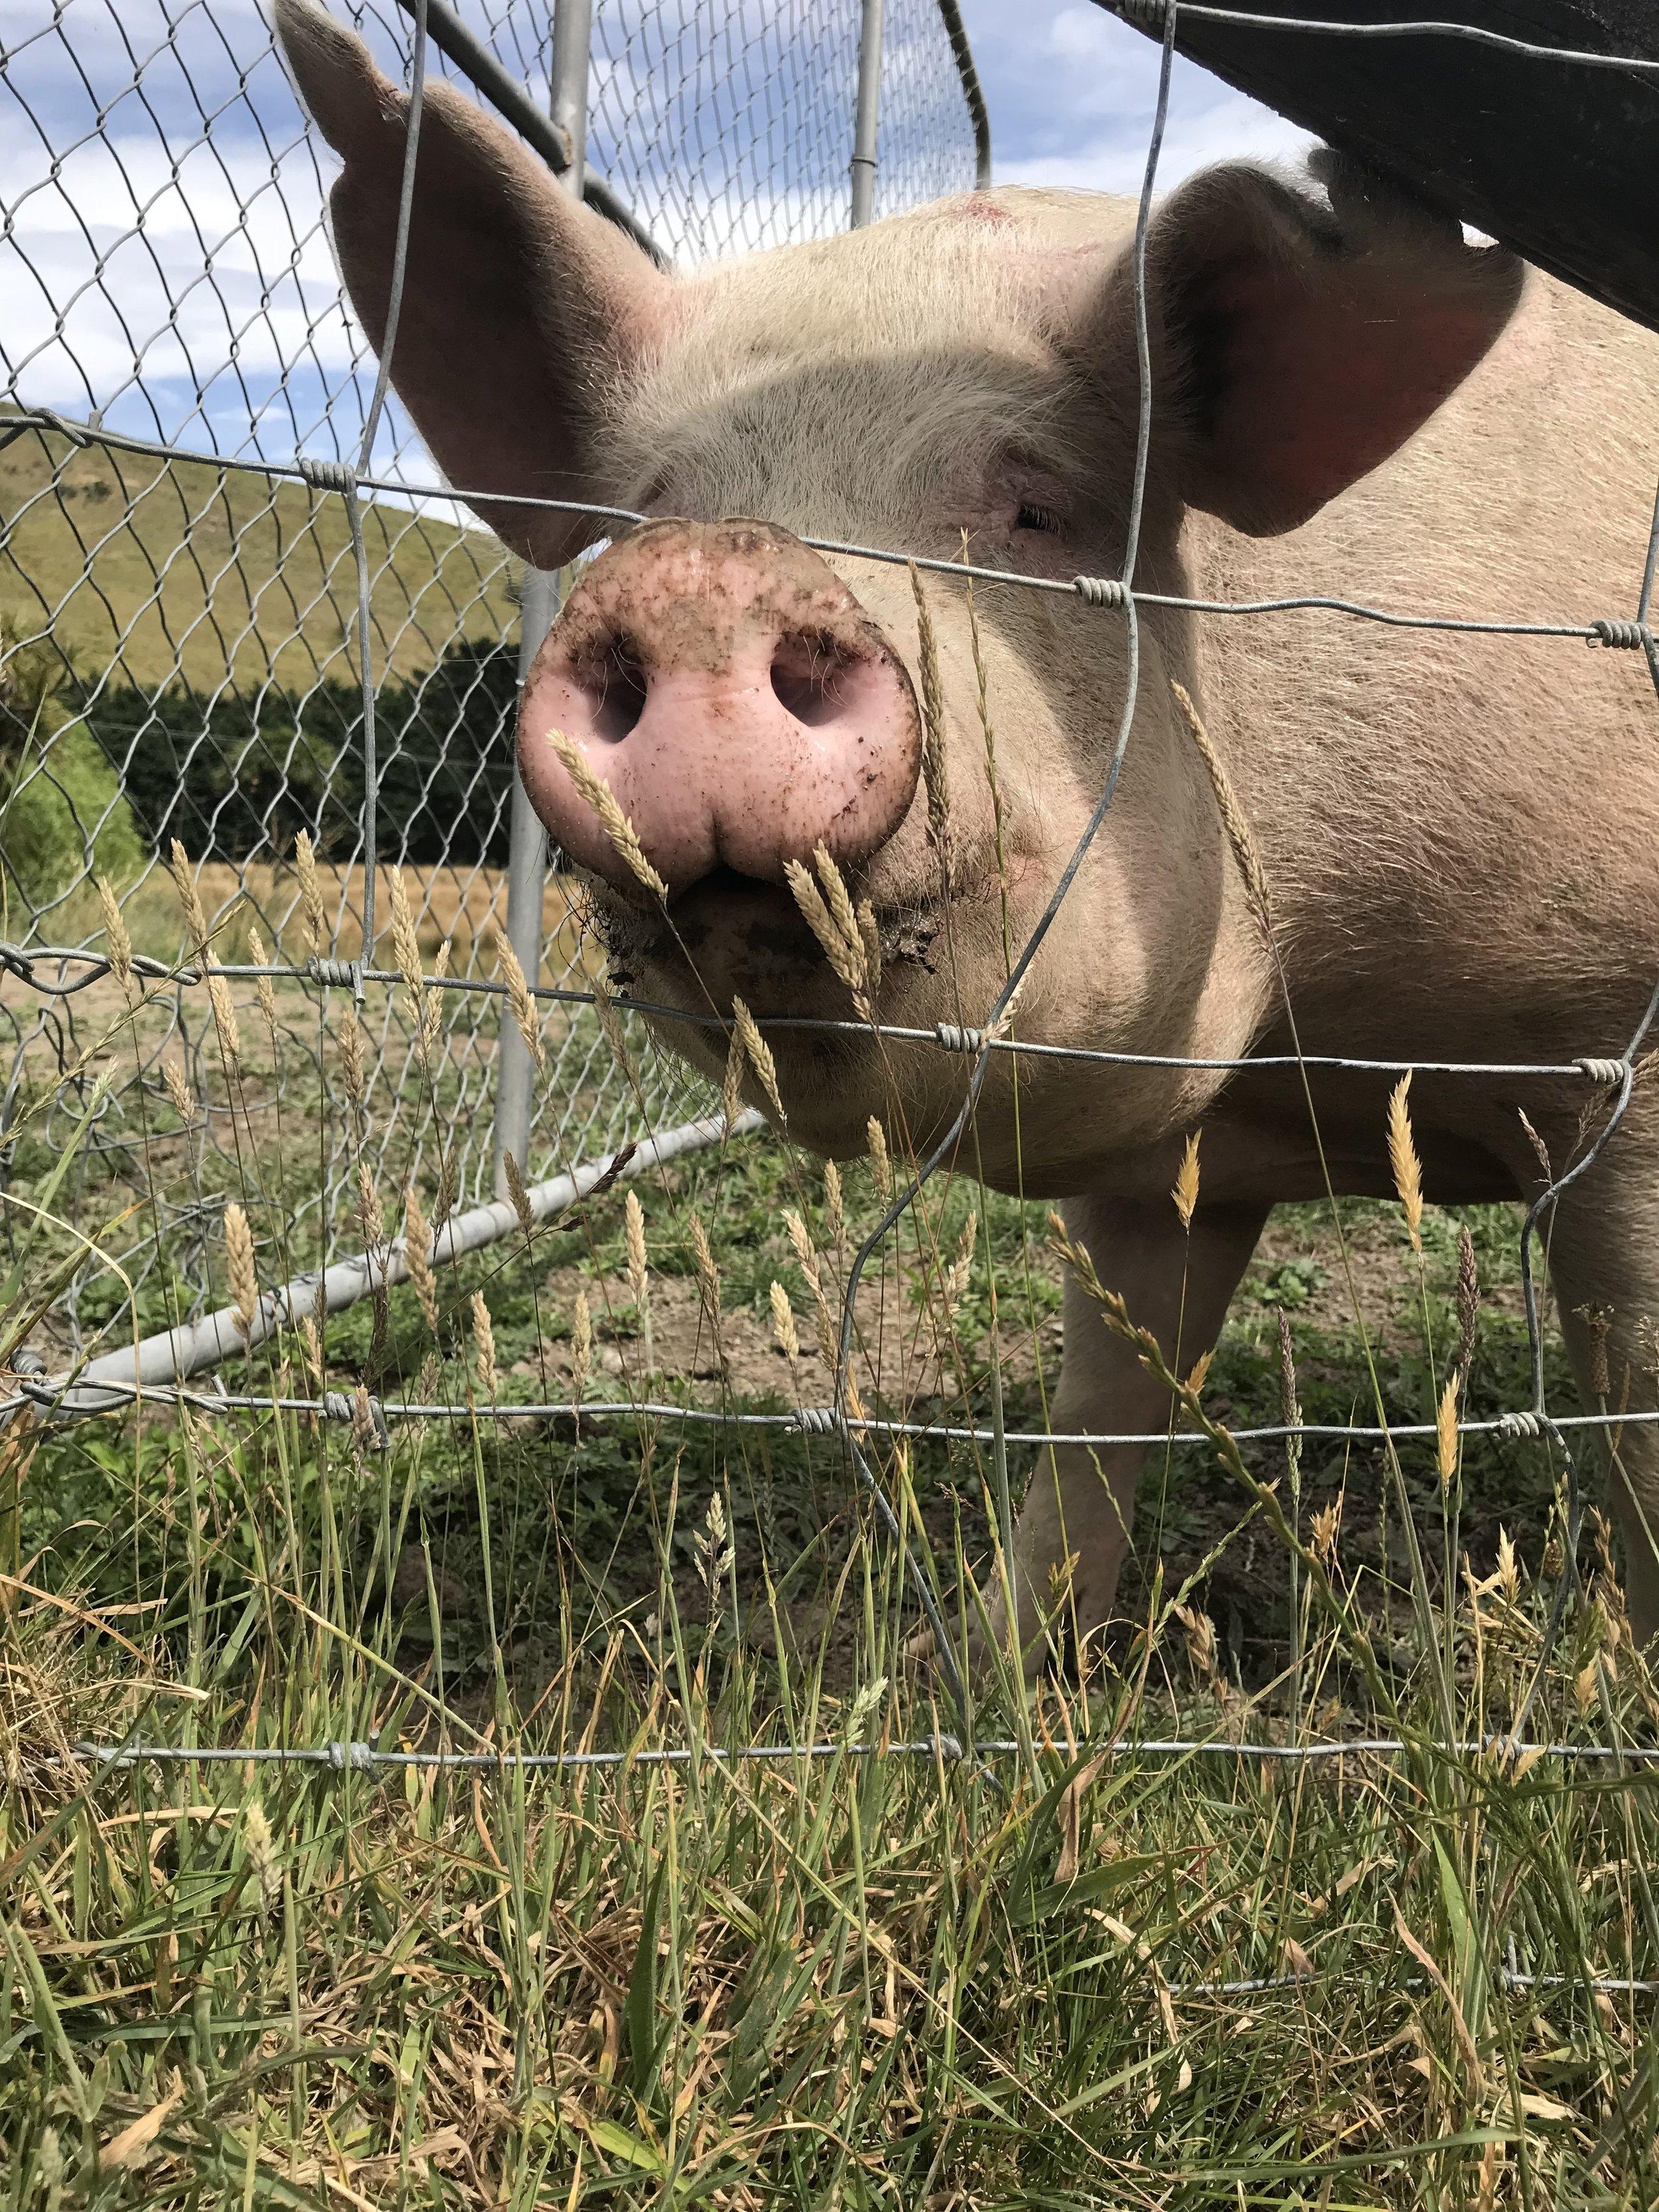 Pig, Wairarapa (image by Jacqui Gibson).